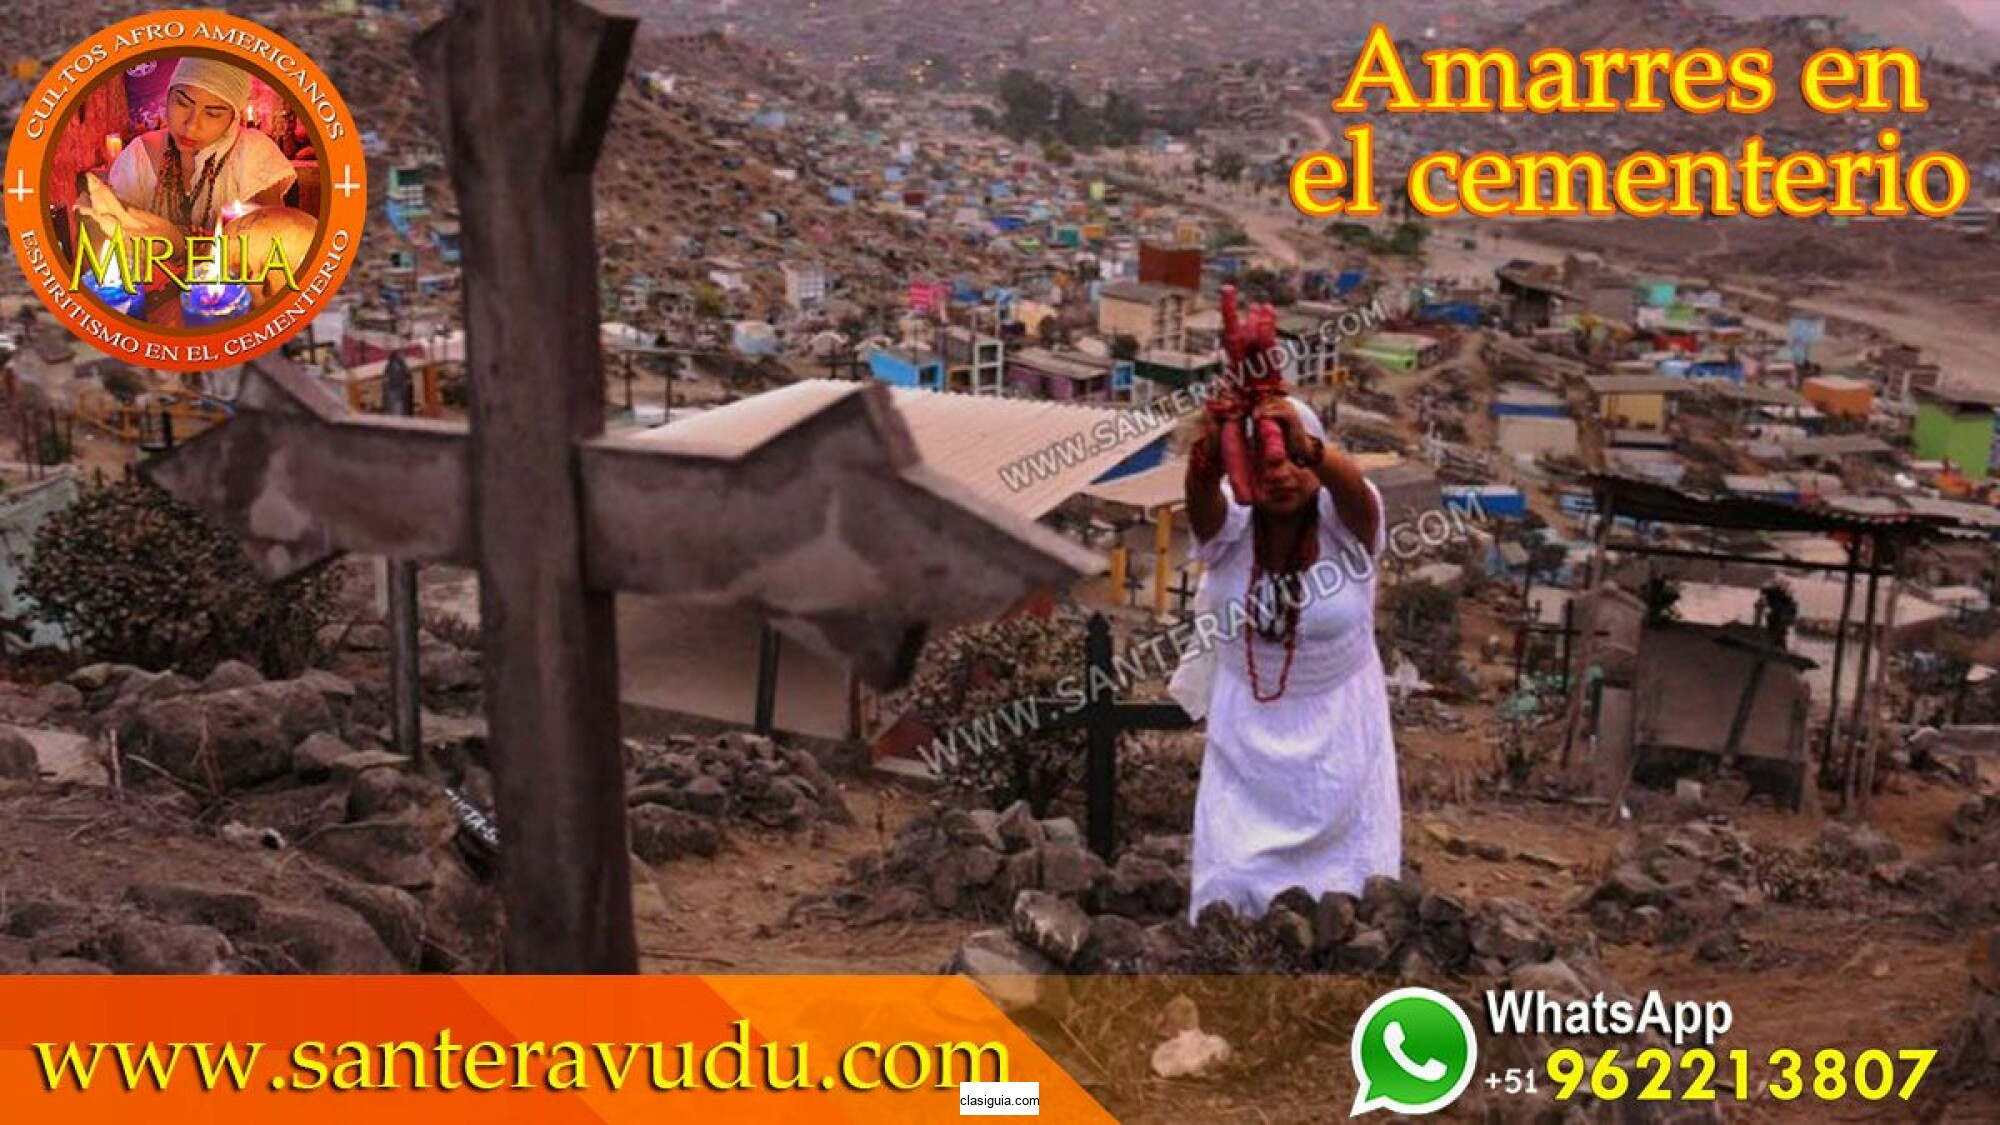 SANTERA VUDU MIRELLA PODEROSO AMARRES DE AMOR EN HUACHO